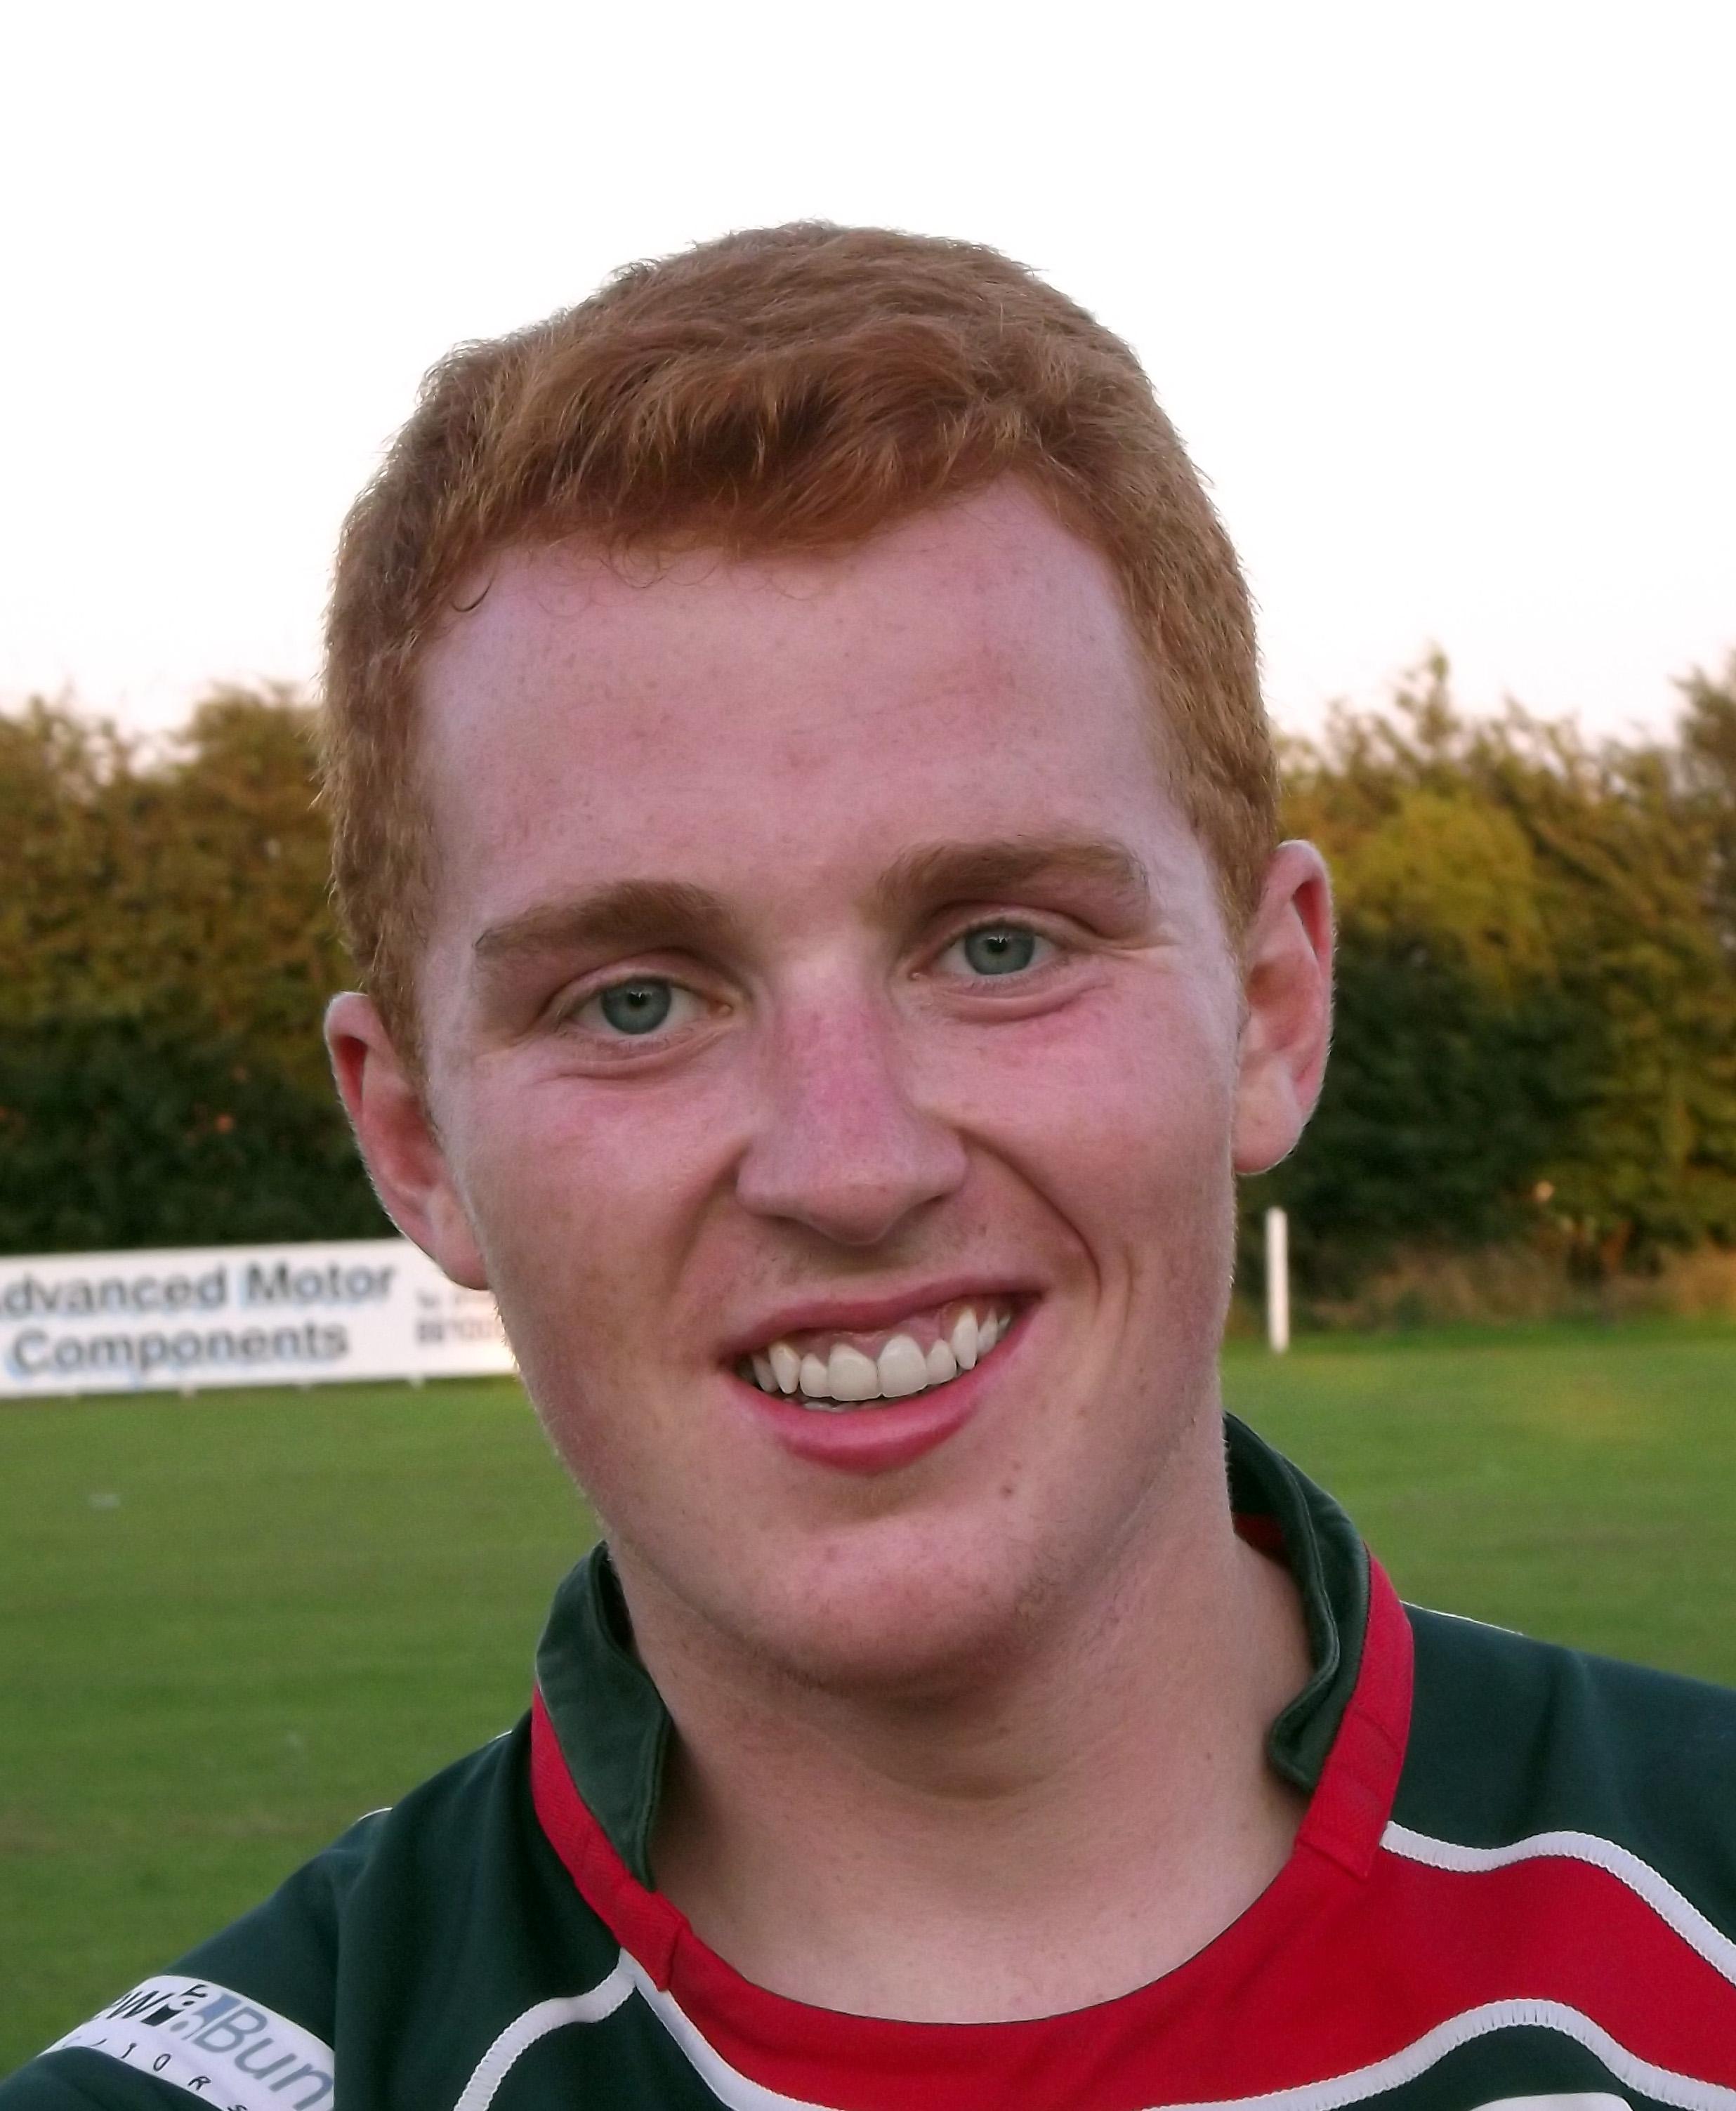 Danny Quinn